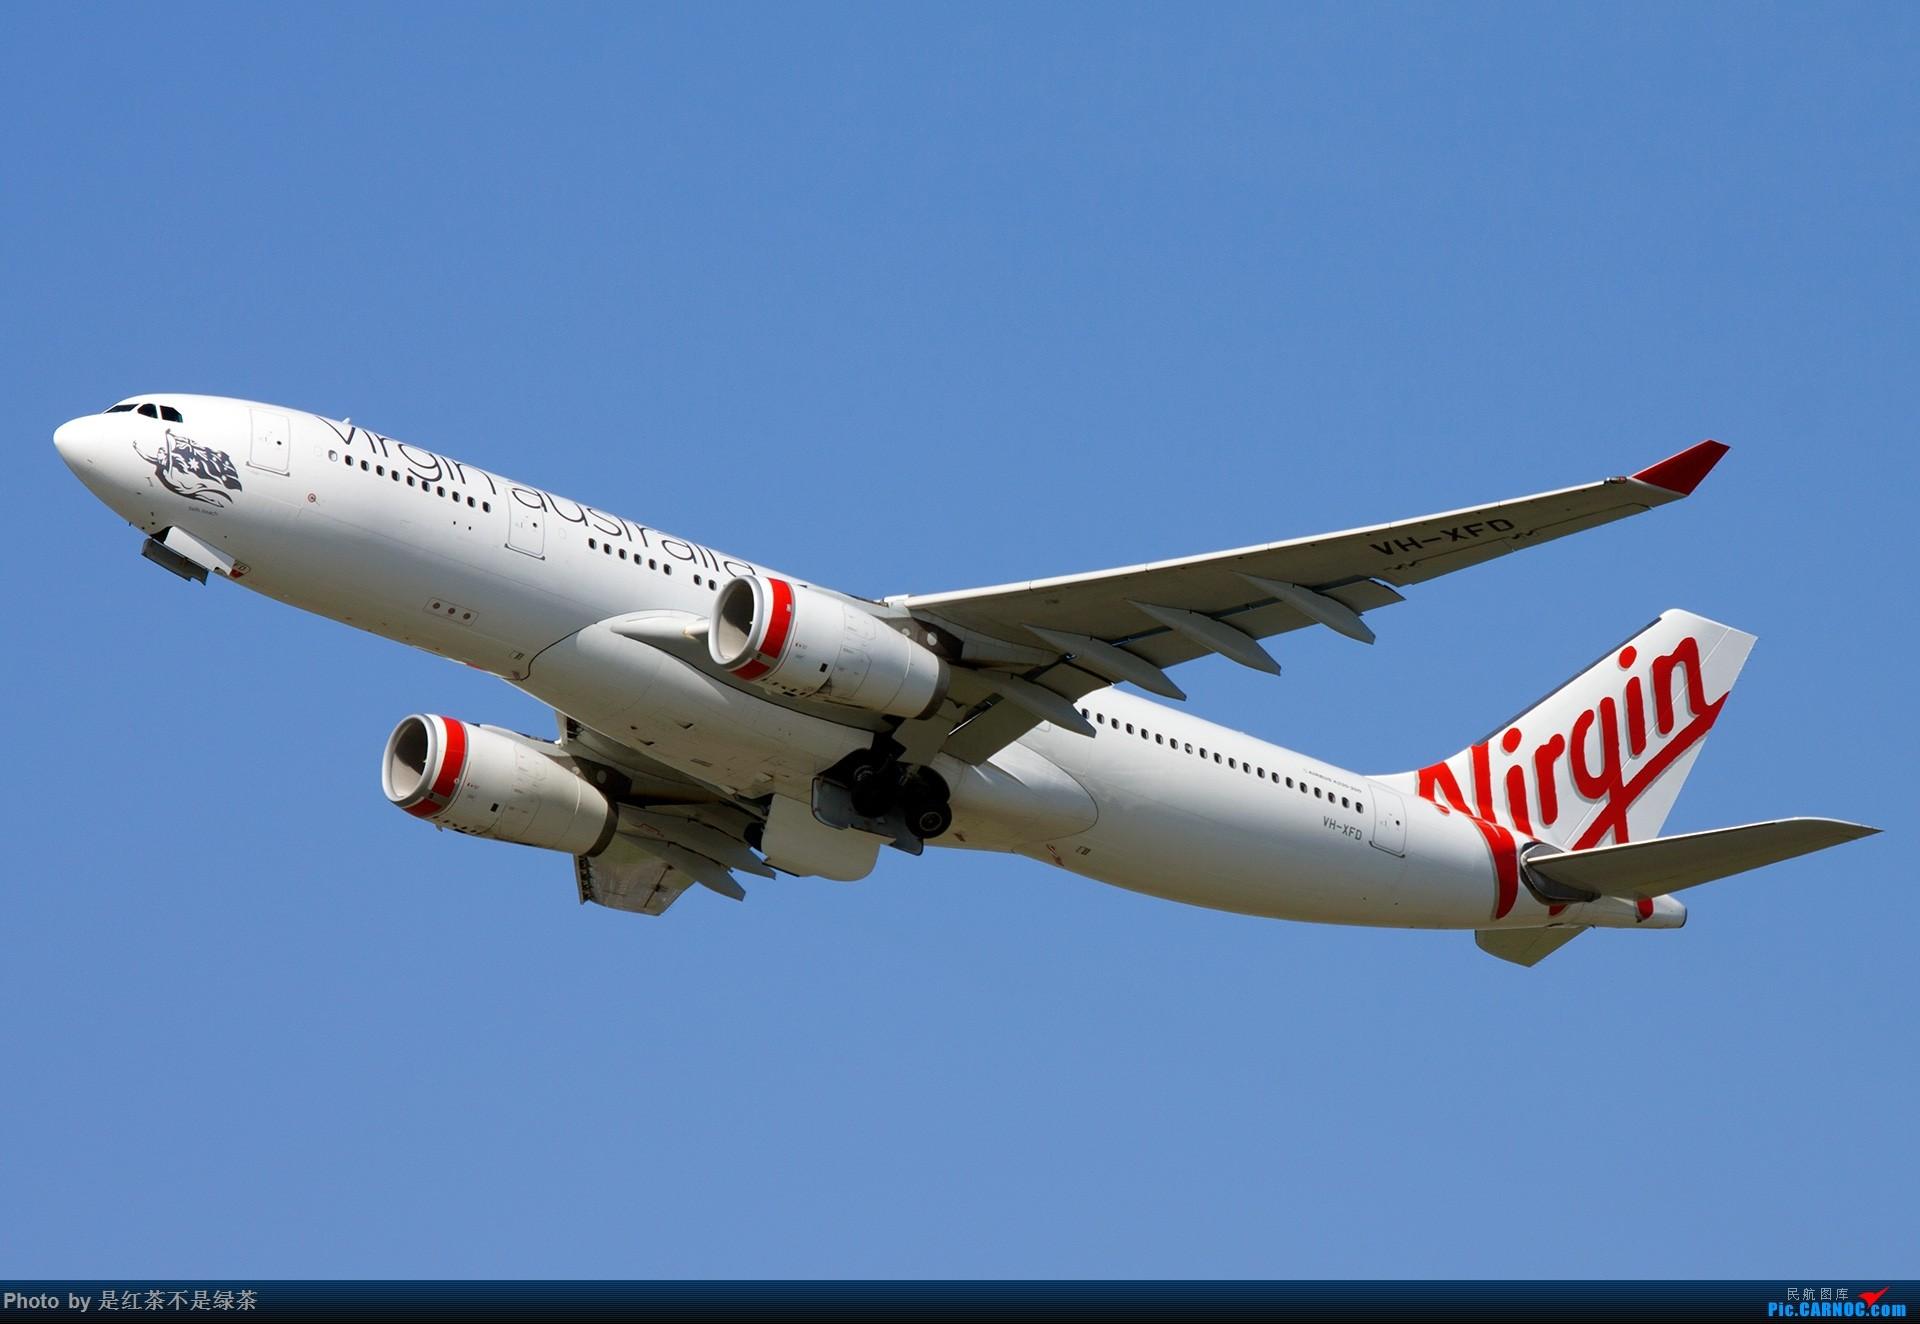 Re:[原创]【红茶拍机】澳洲行半日拍机,距离上次发帖居然有10个月了! AIRBUS A330-200 VH-XFD 澳大利亚悉尼金斯福德·史密斯机场